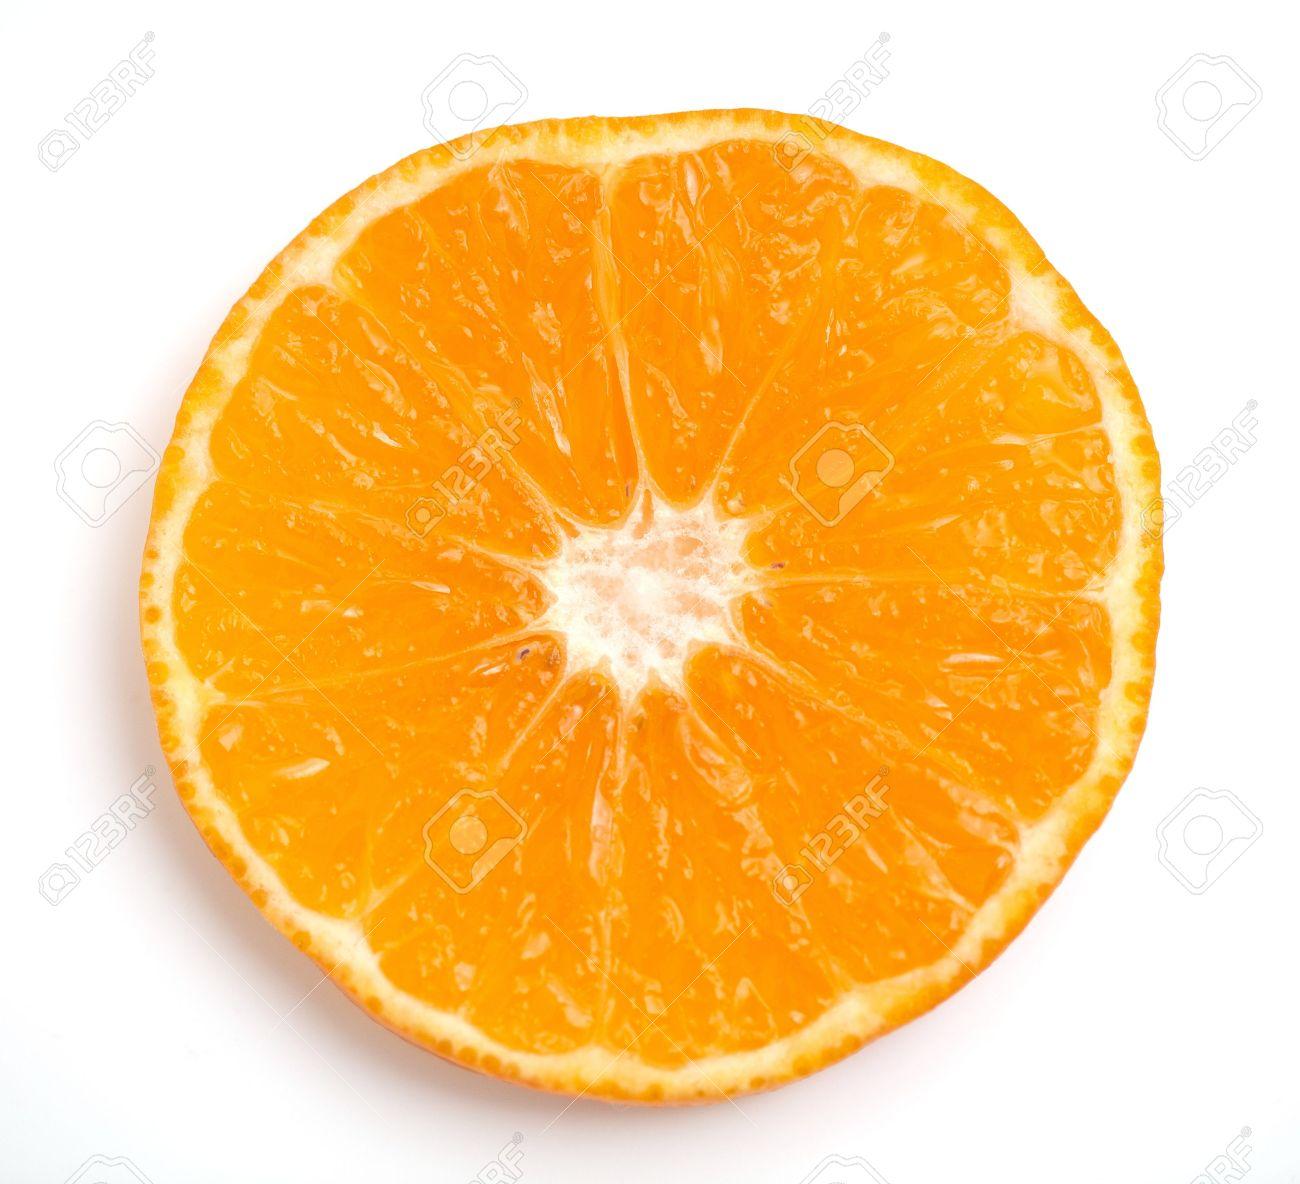 14464467-slice-of-orange-closeup-on-whit